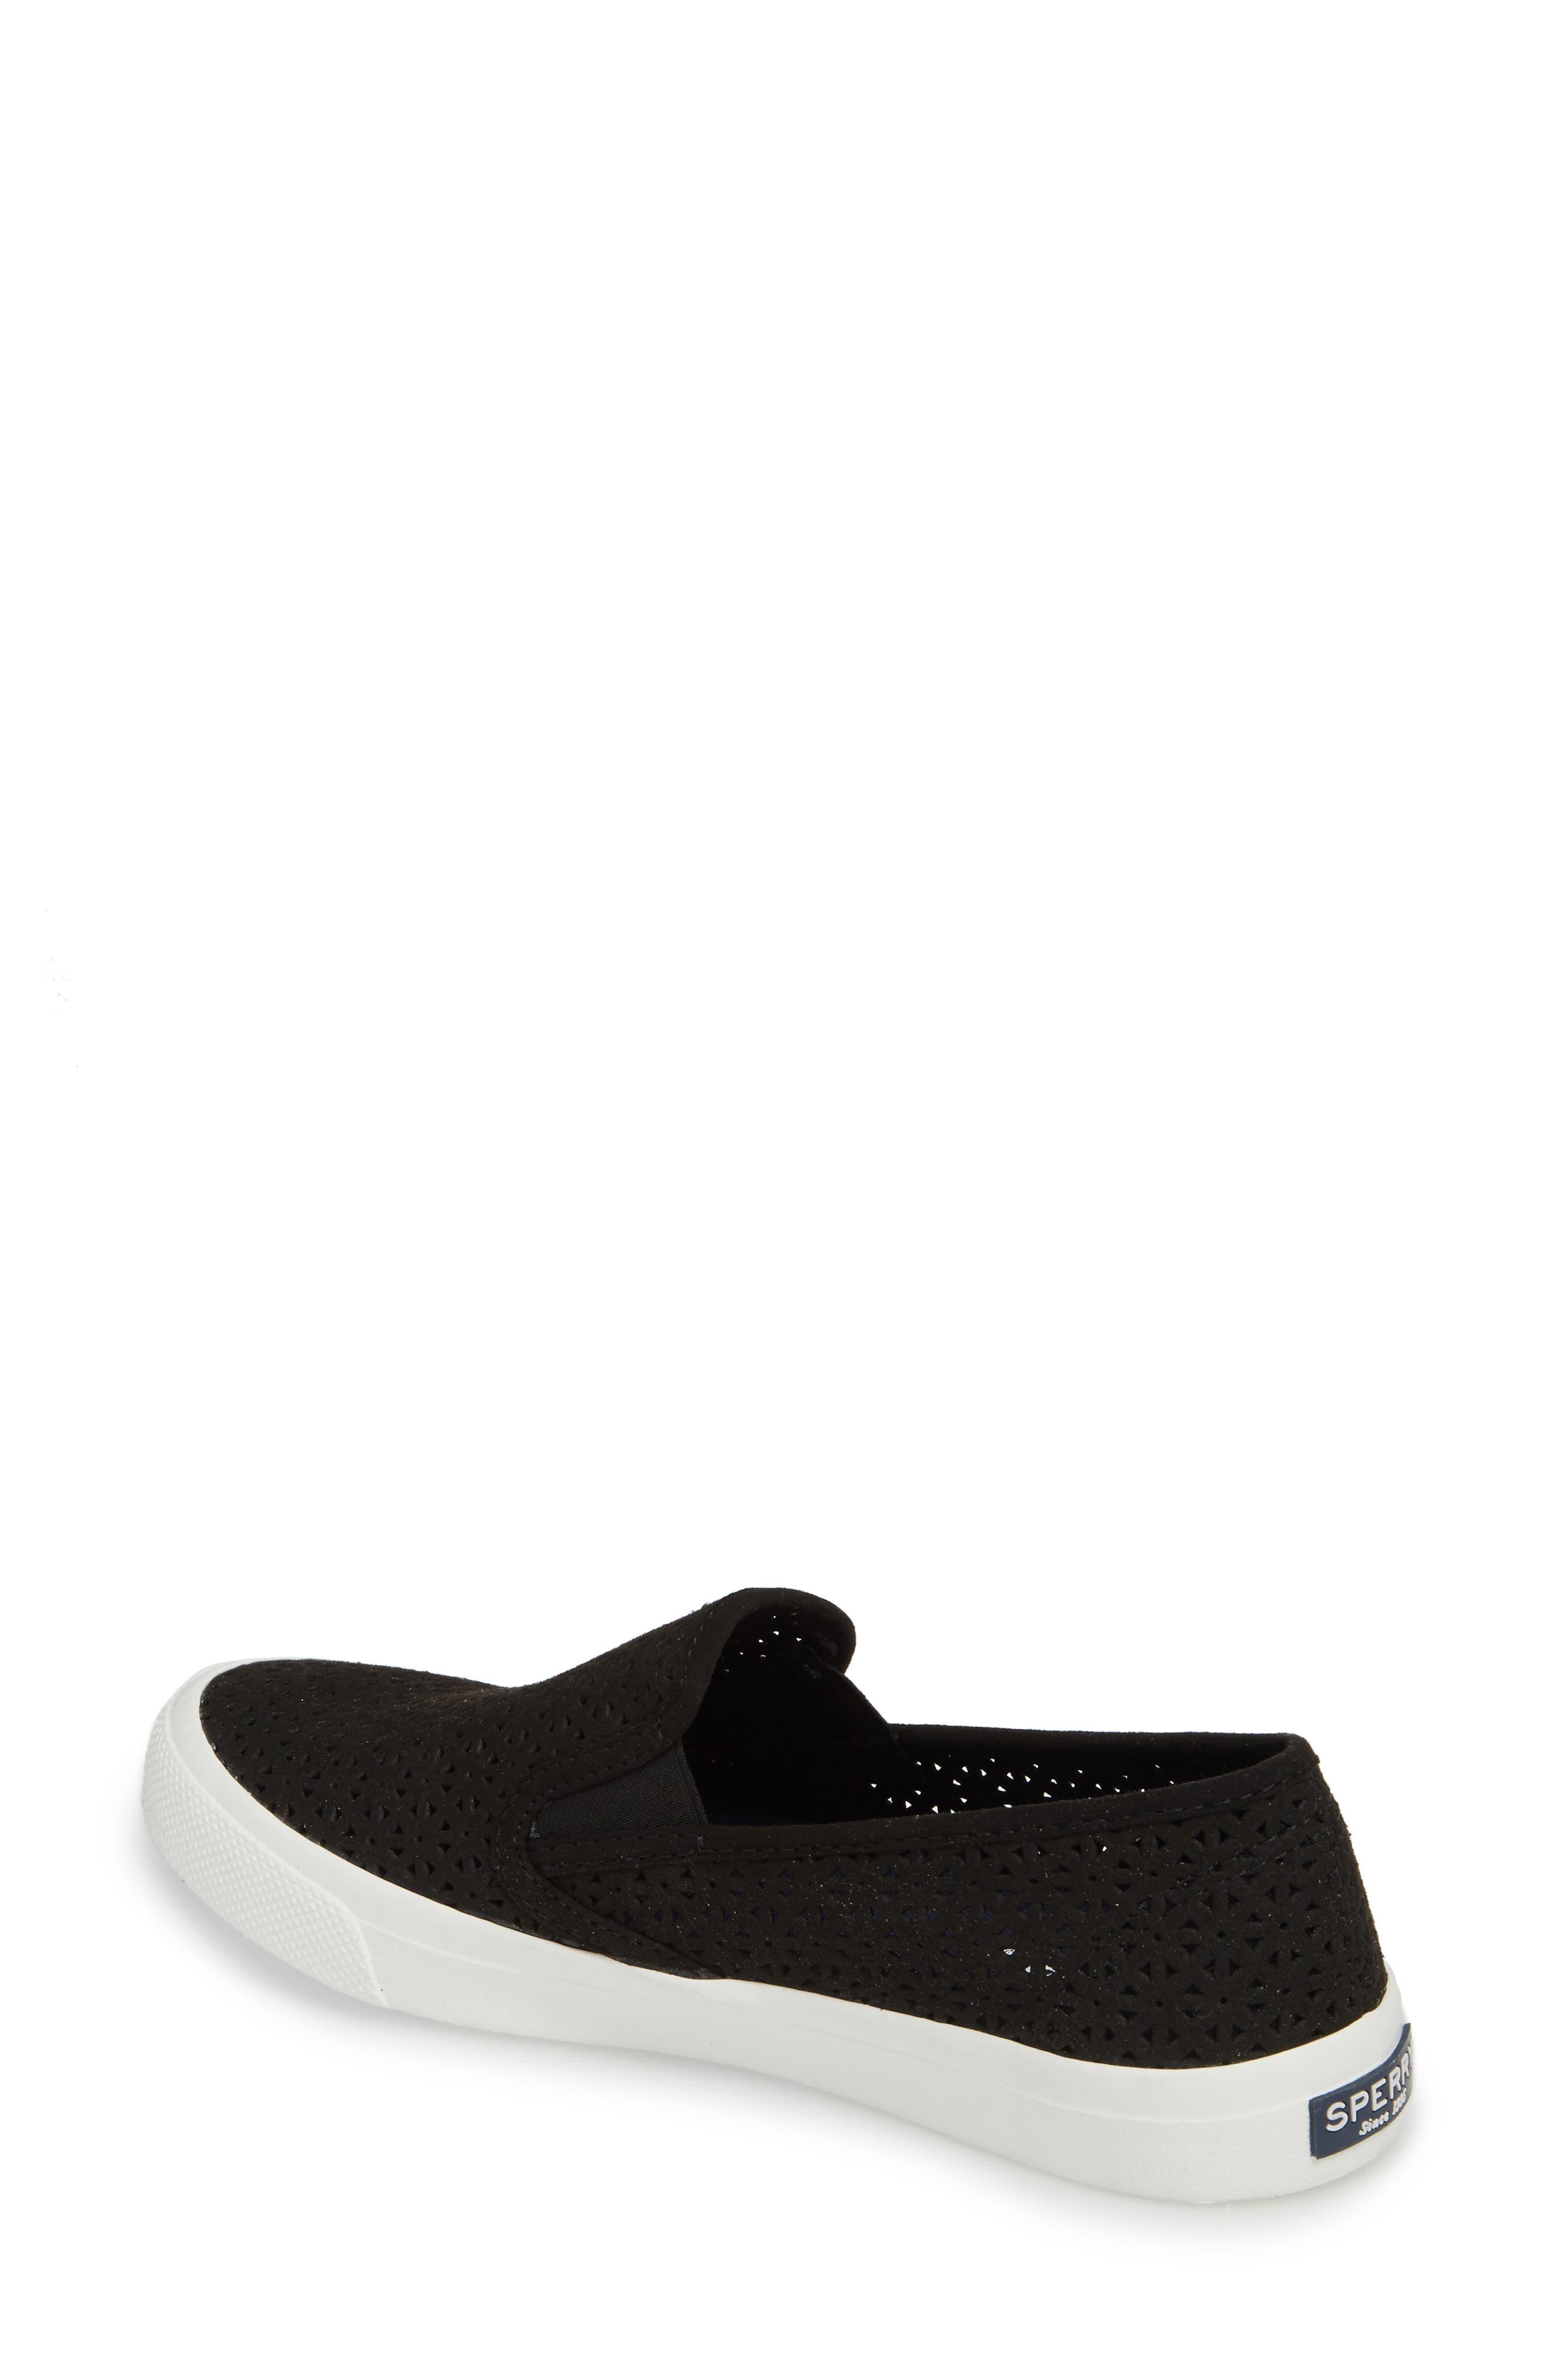 Seaside Nautical Perforated Slip-On Sneaker,                             Alternate thumbnail 2, color,                             BLACK LEATHER